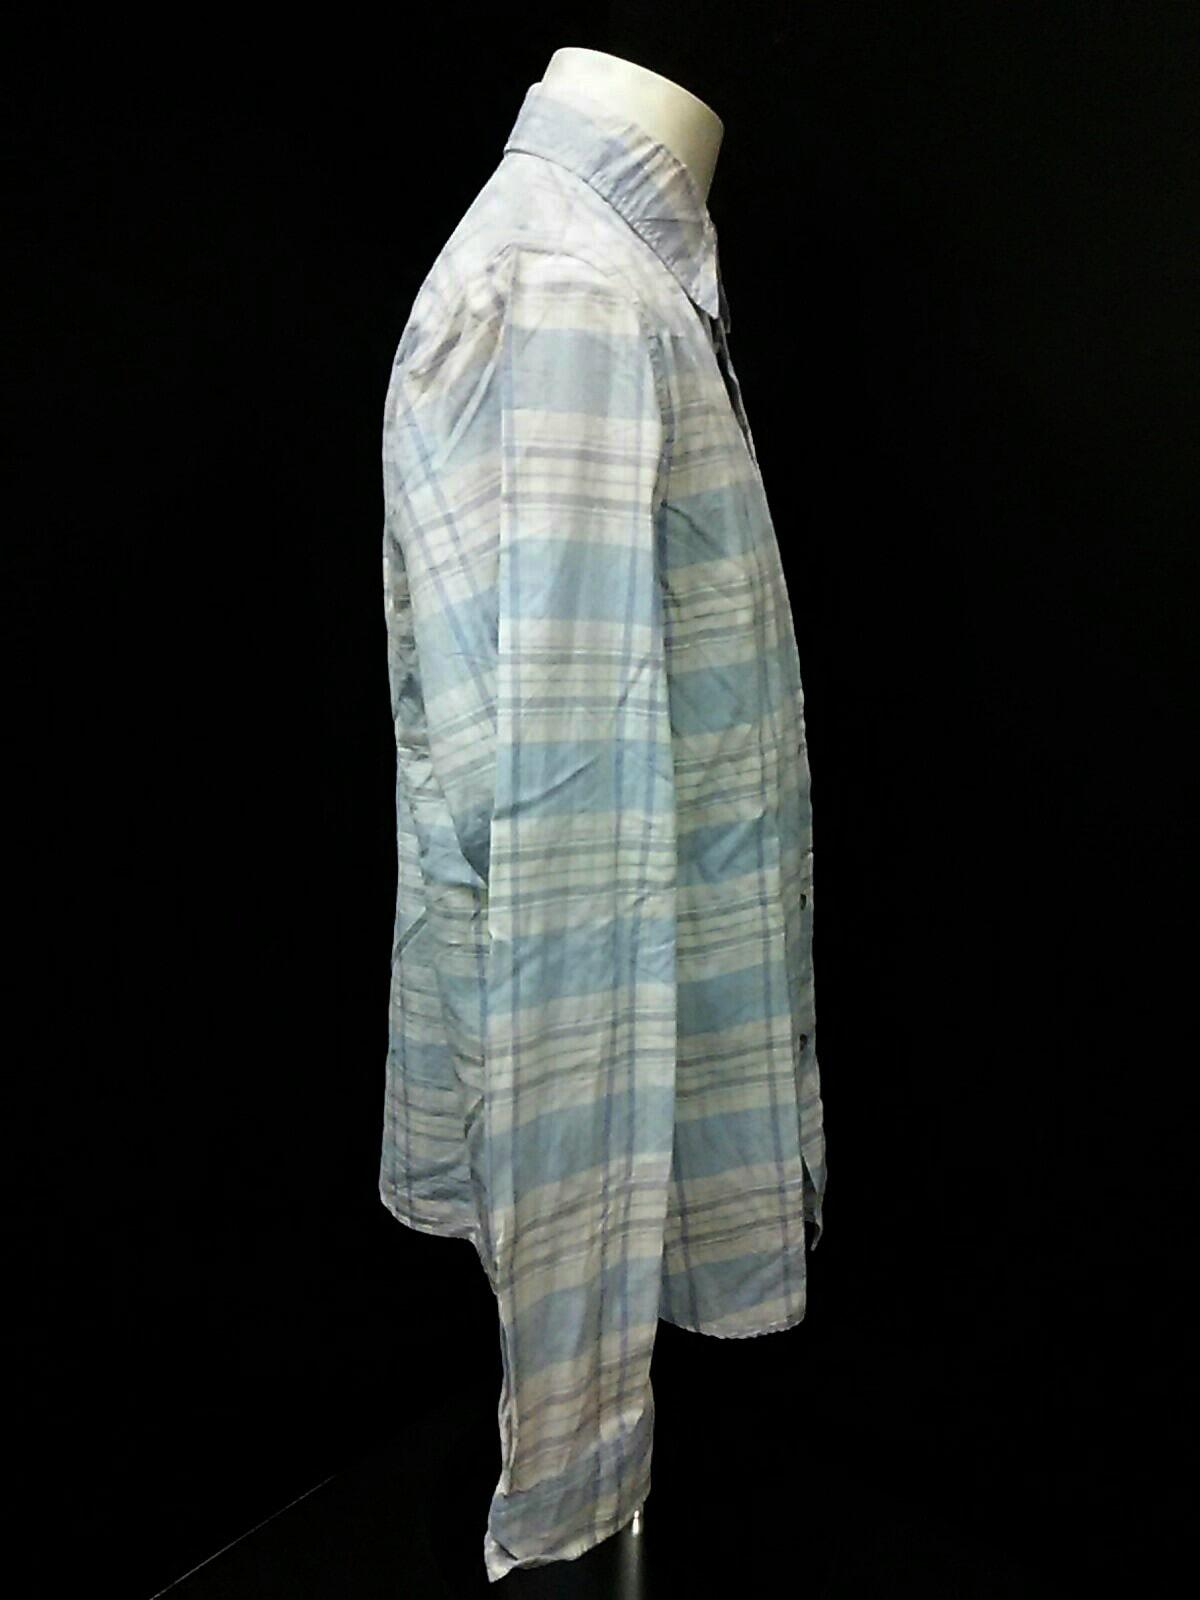 Seagreen(シーグリーン)のシャツ